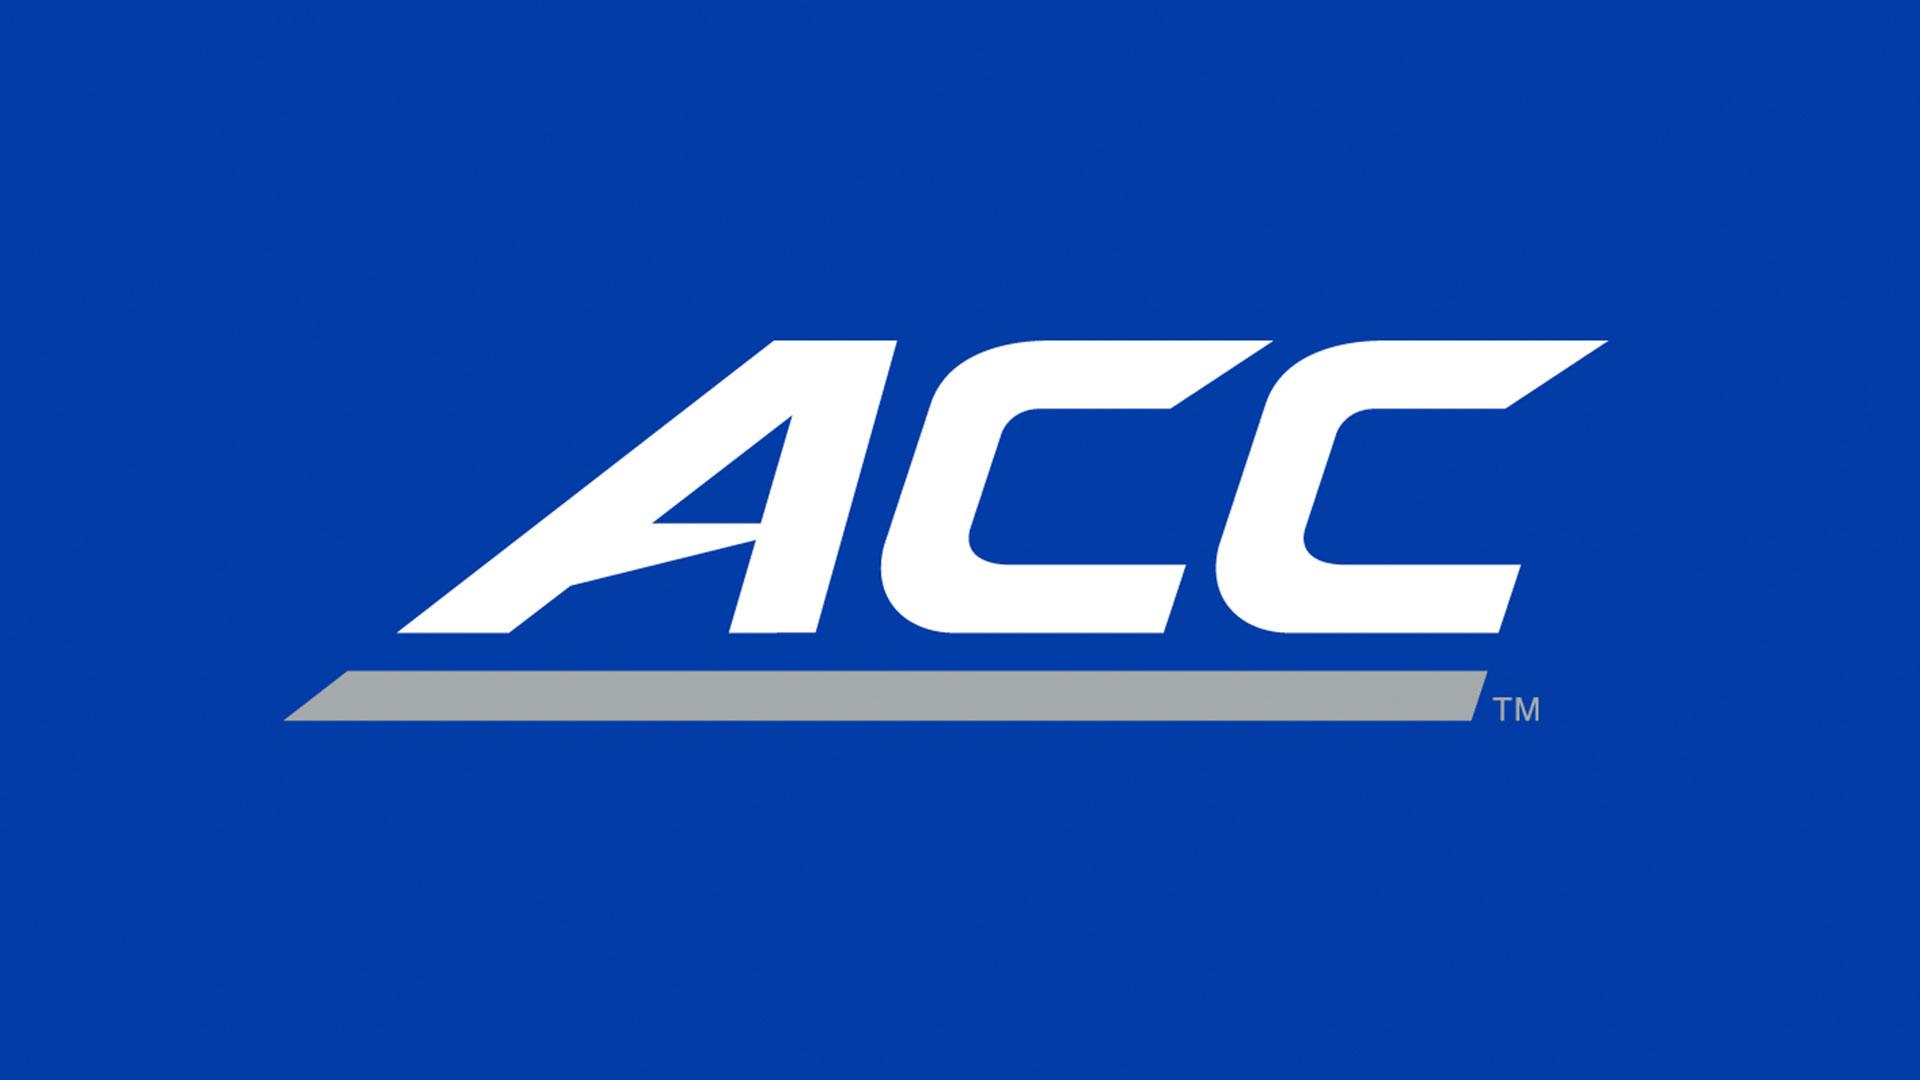 Atlantic Coast Conference logo